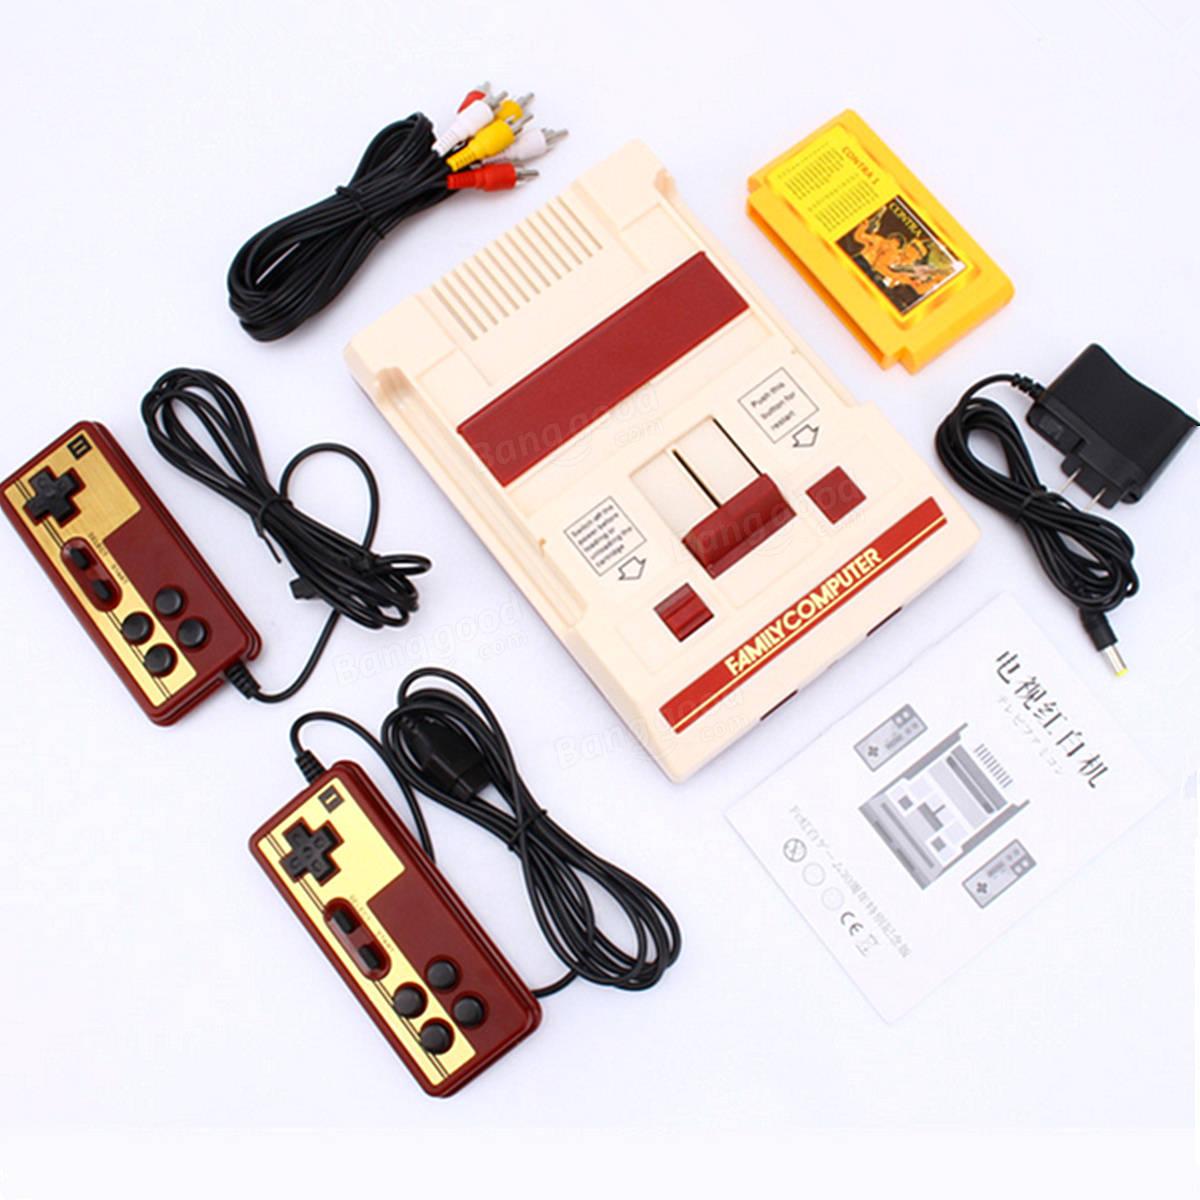 Subor D99 8 Bit Classic TV Video NTSC Game Console Retro Gamepad 500